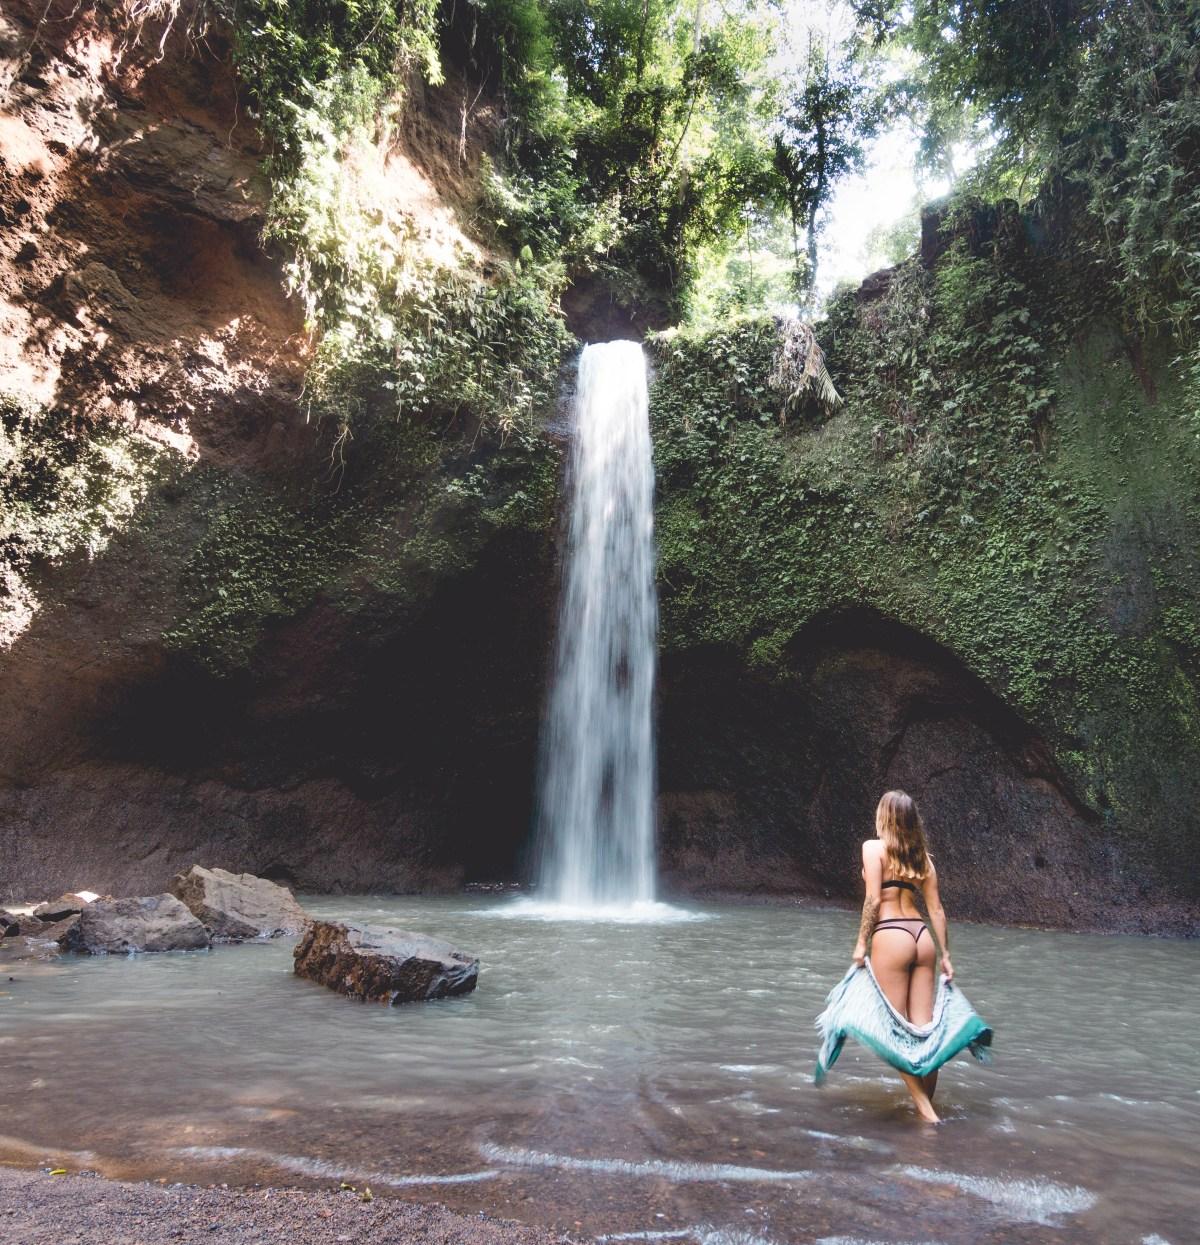 Bali Waterfalls- Tibumana